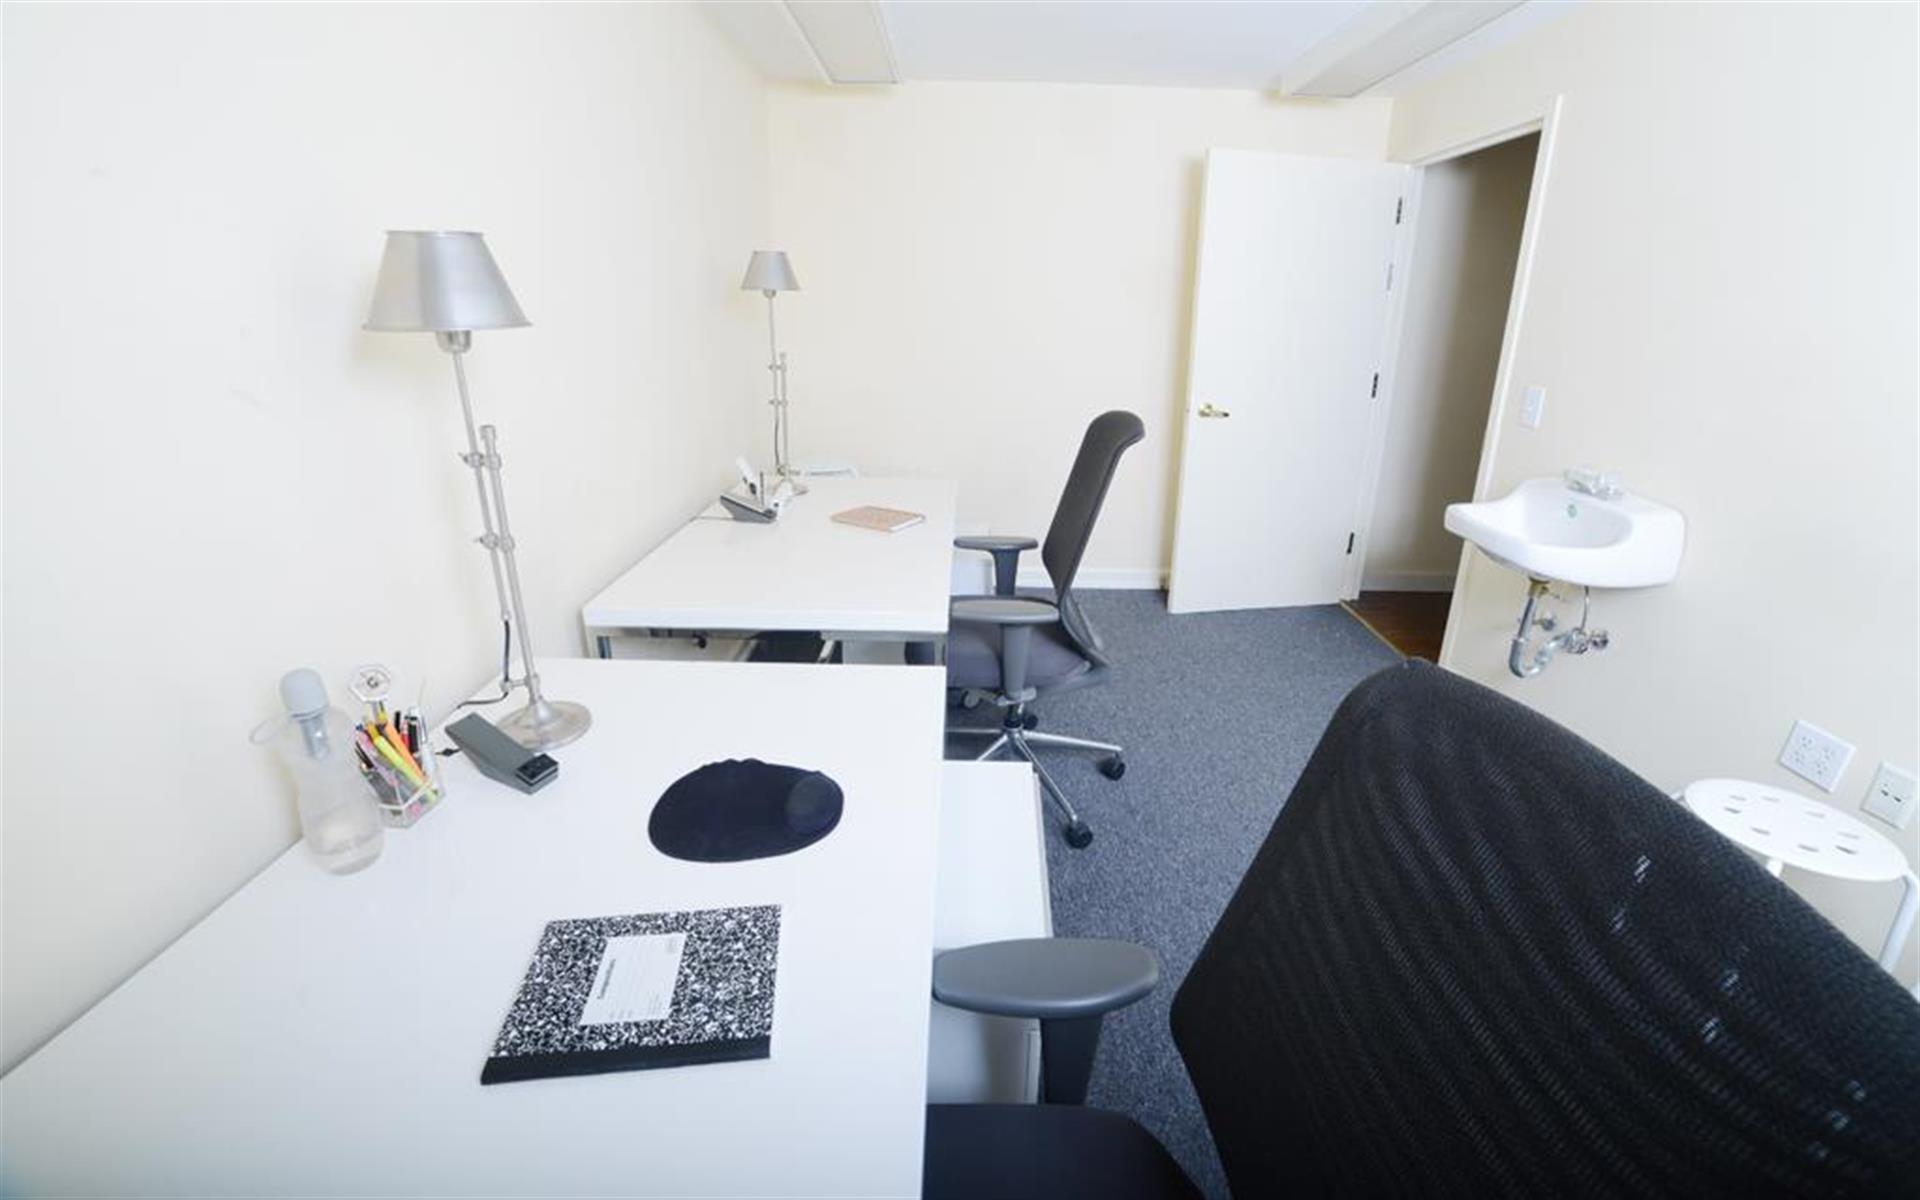 Space69.com - G4 - 6-8 person office suite